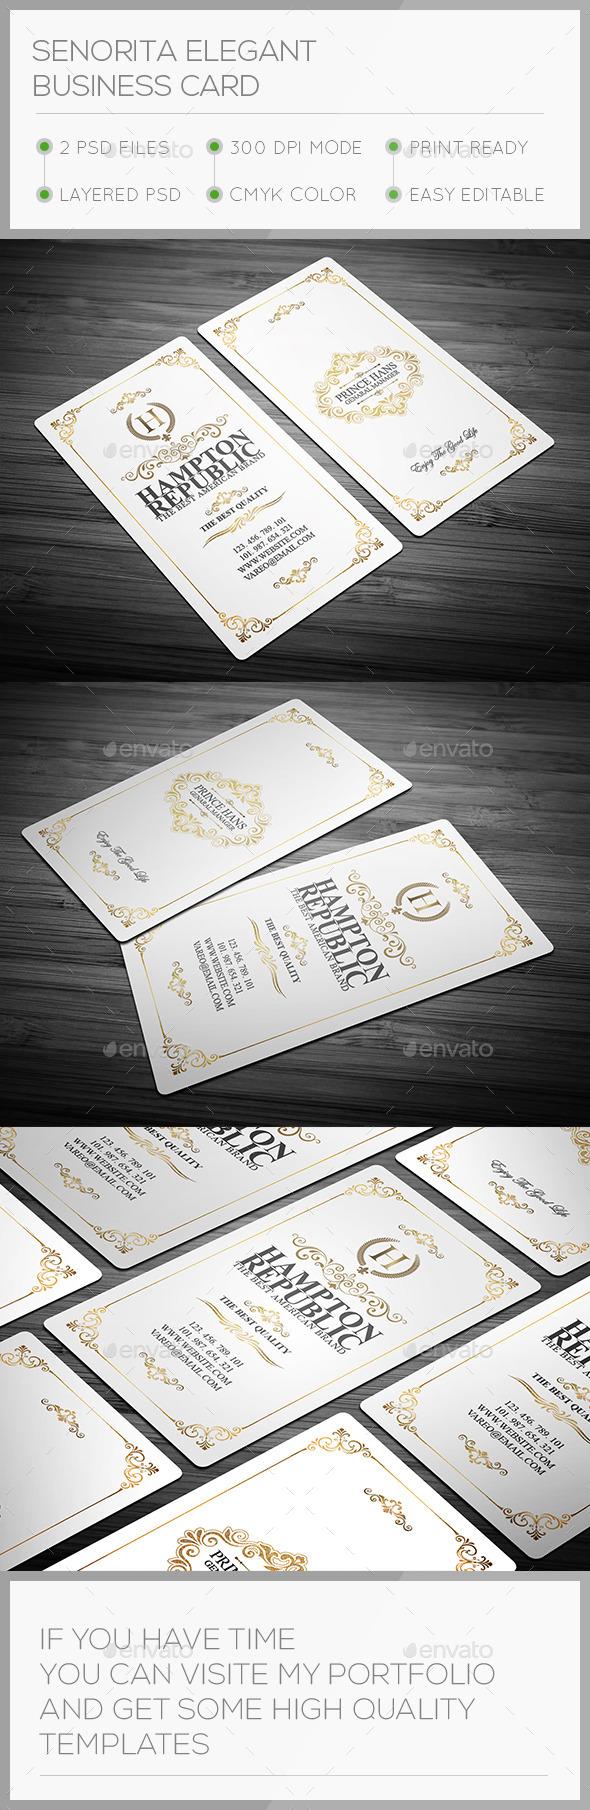 Senorita Elegant Business Card - Corporate Business Cards